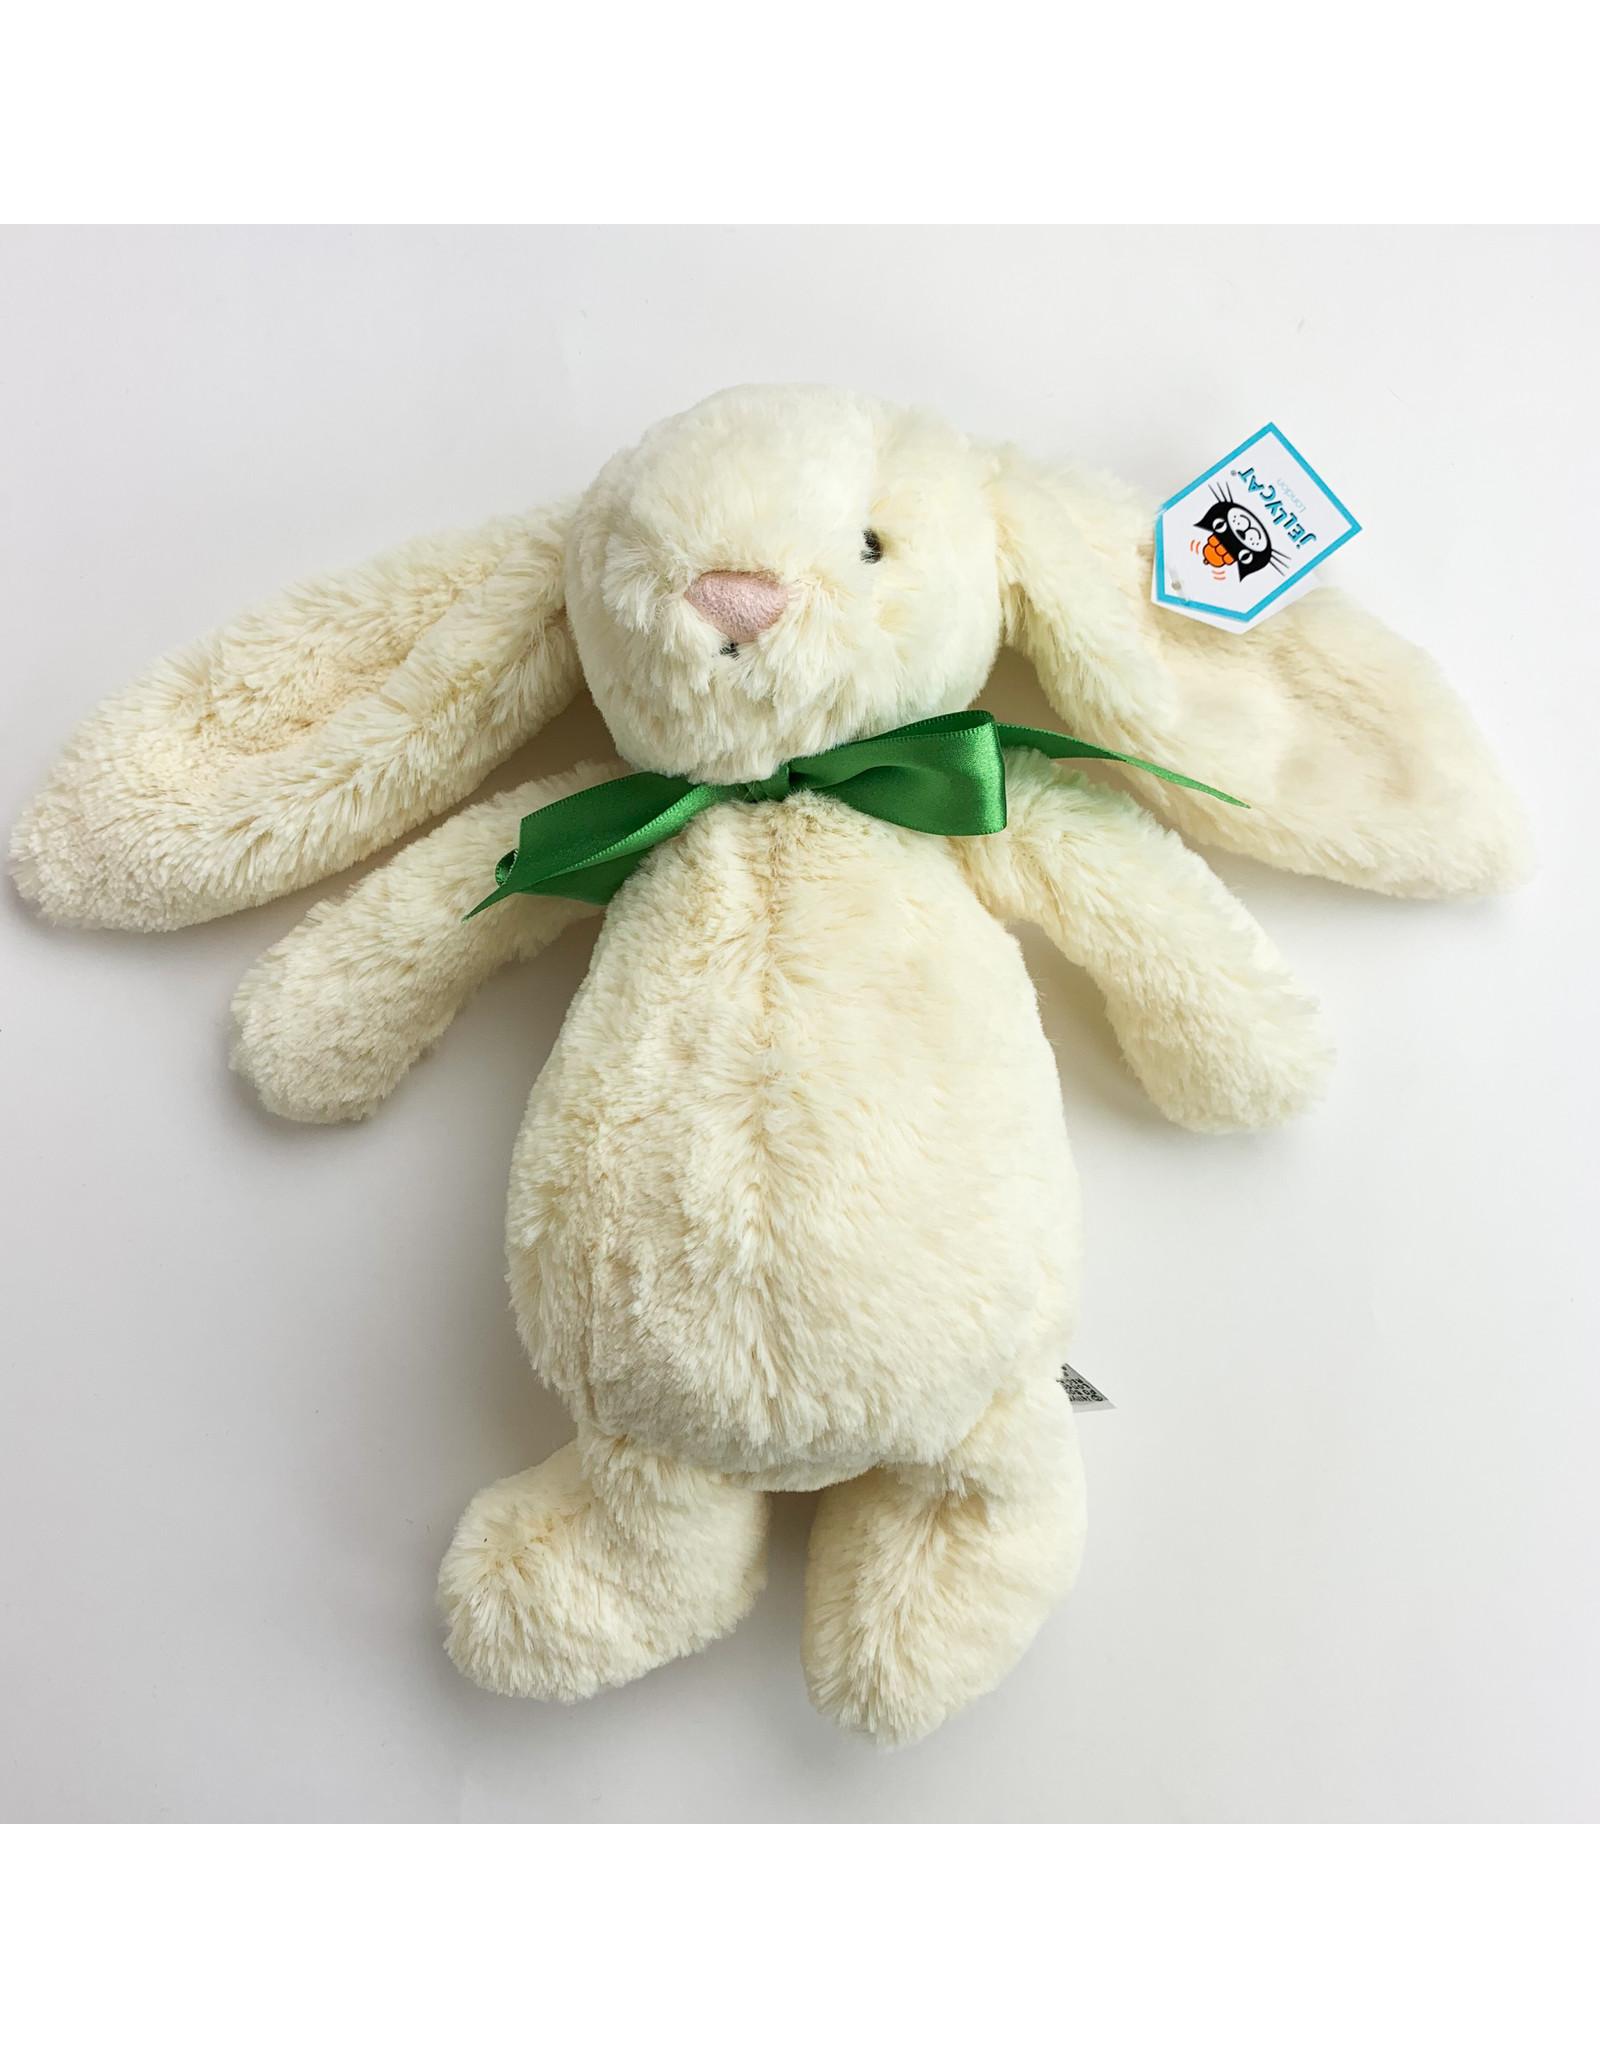 jelly cat Bashful Buttermilk bunny